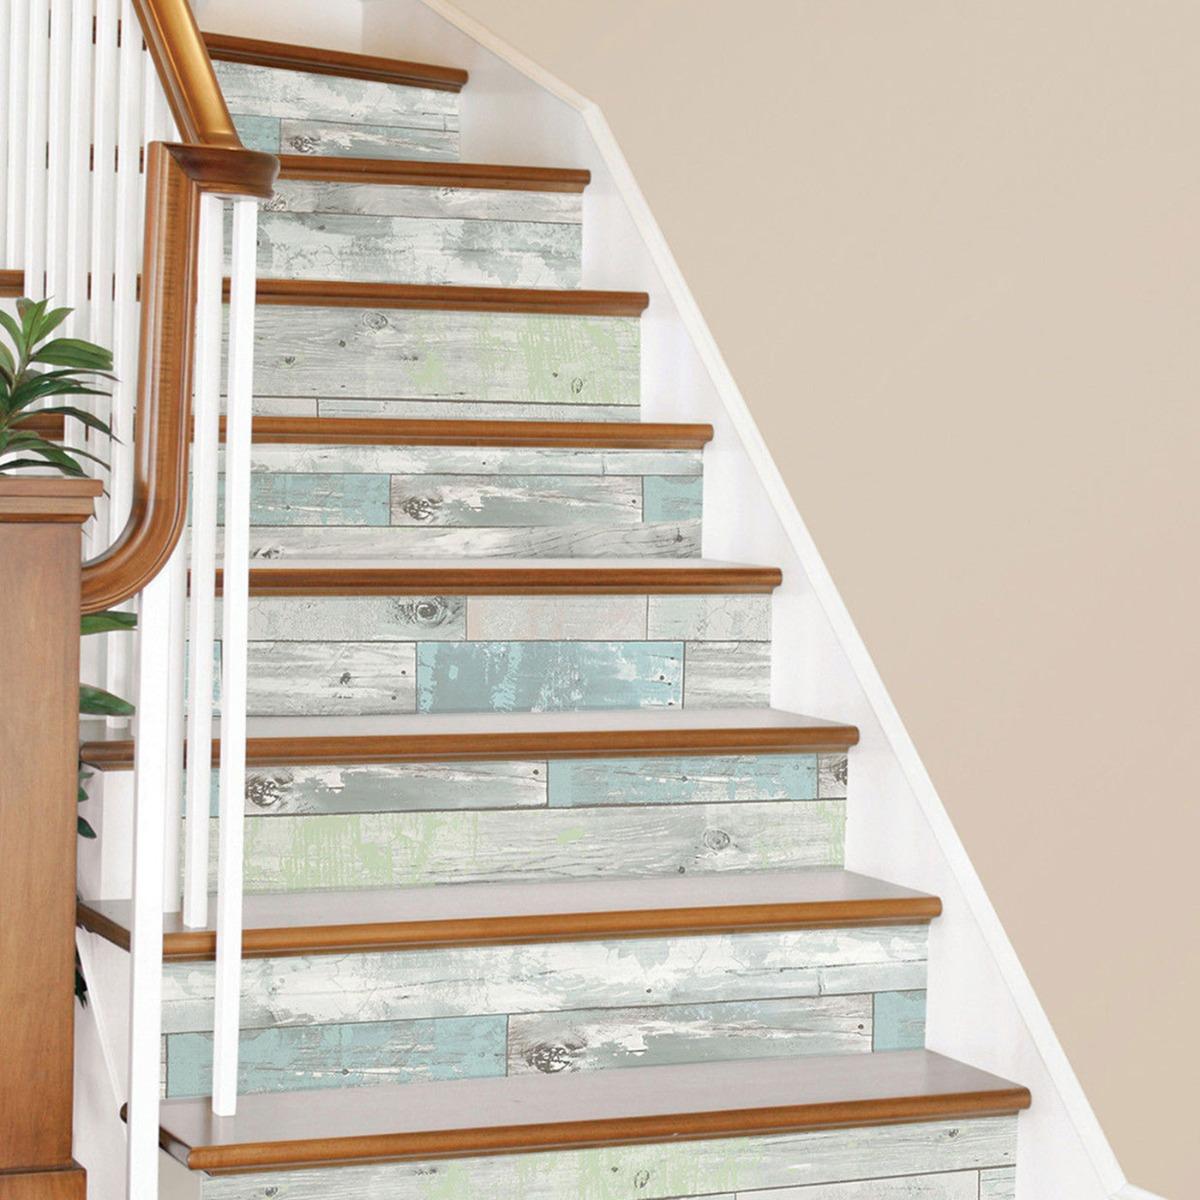 NuWallpaper Beachwood Peel And Stick Wallpaper Fine Decor NU1647 5.5m x 0.52m